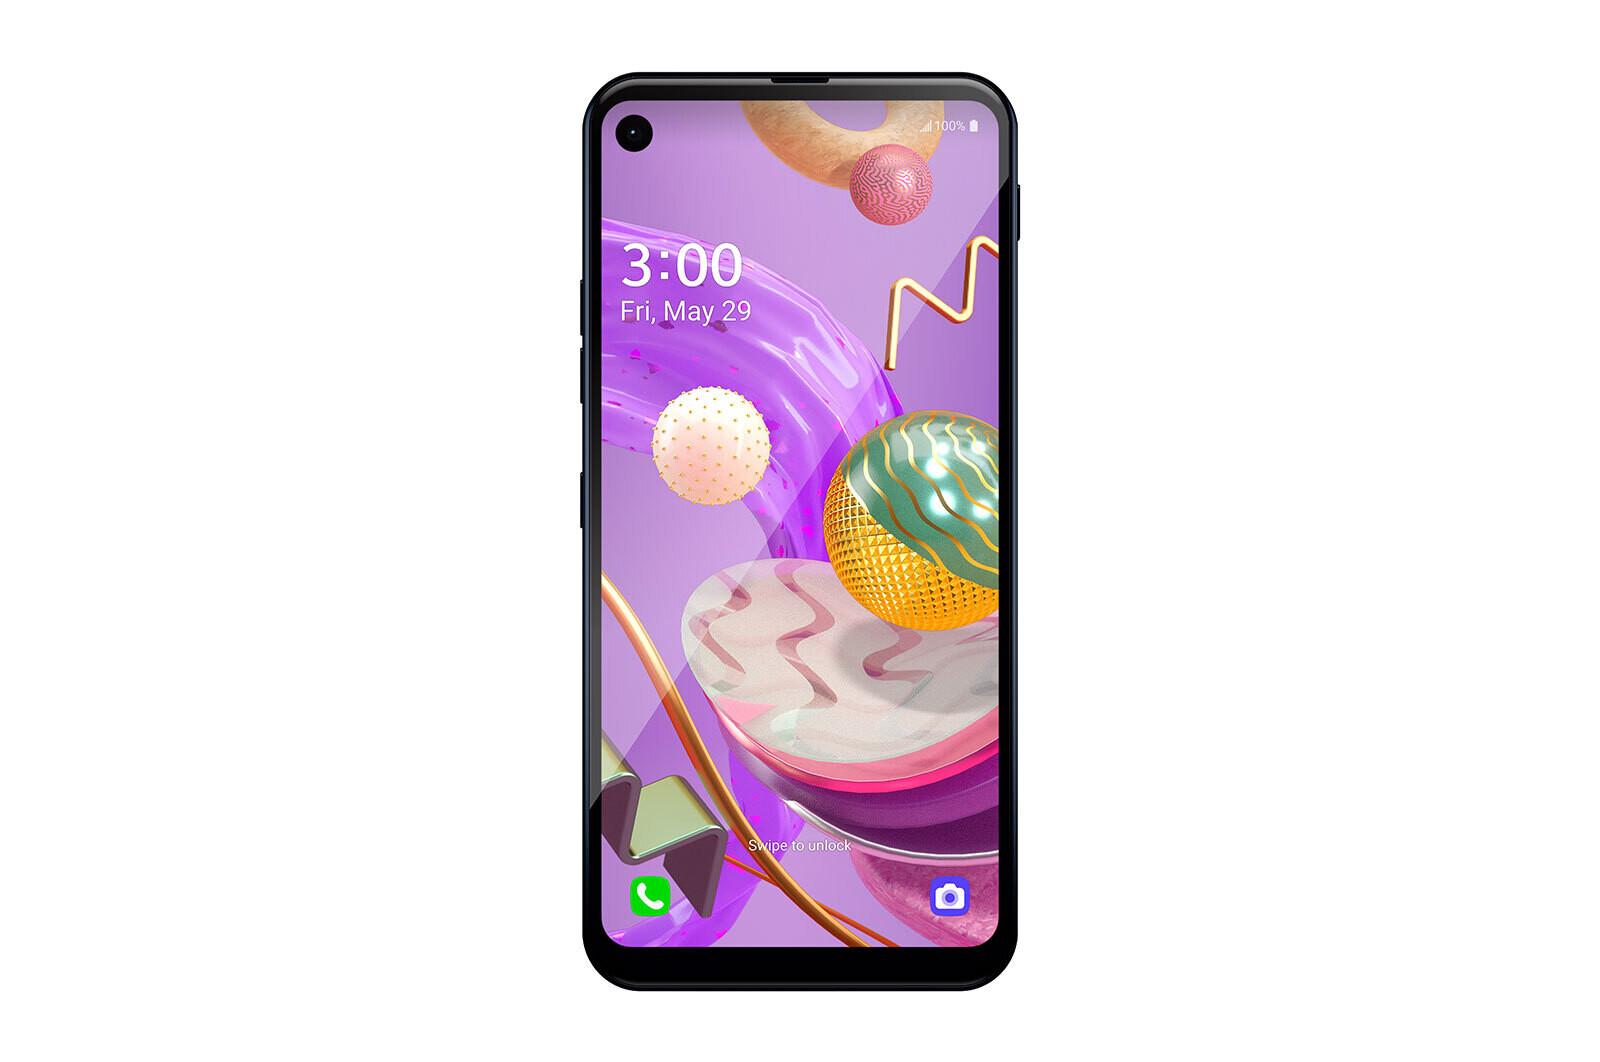 LG-Q70-unlocked-price-preorder-US-02.jpg